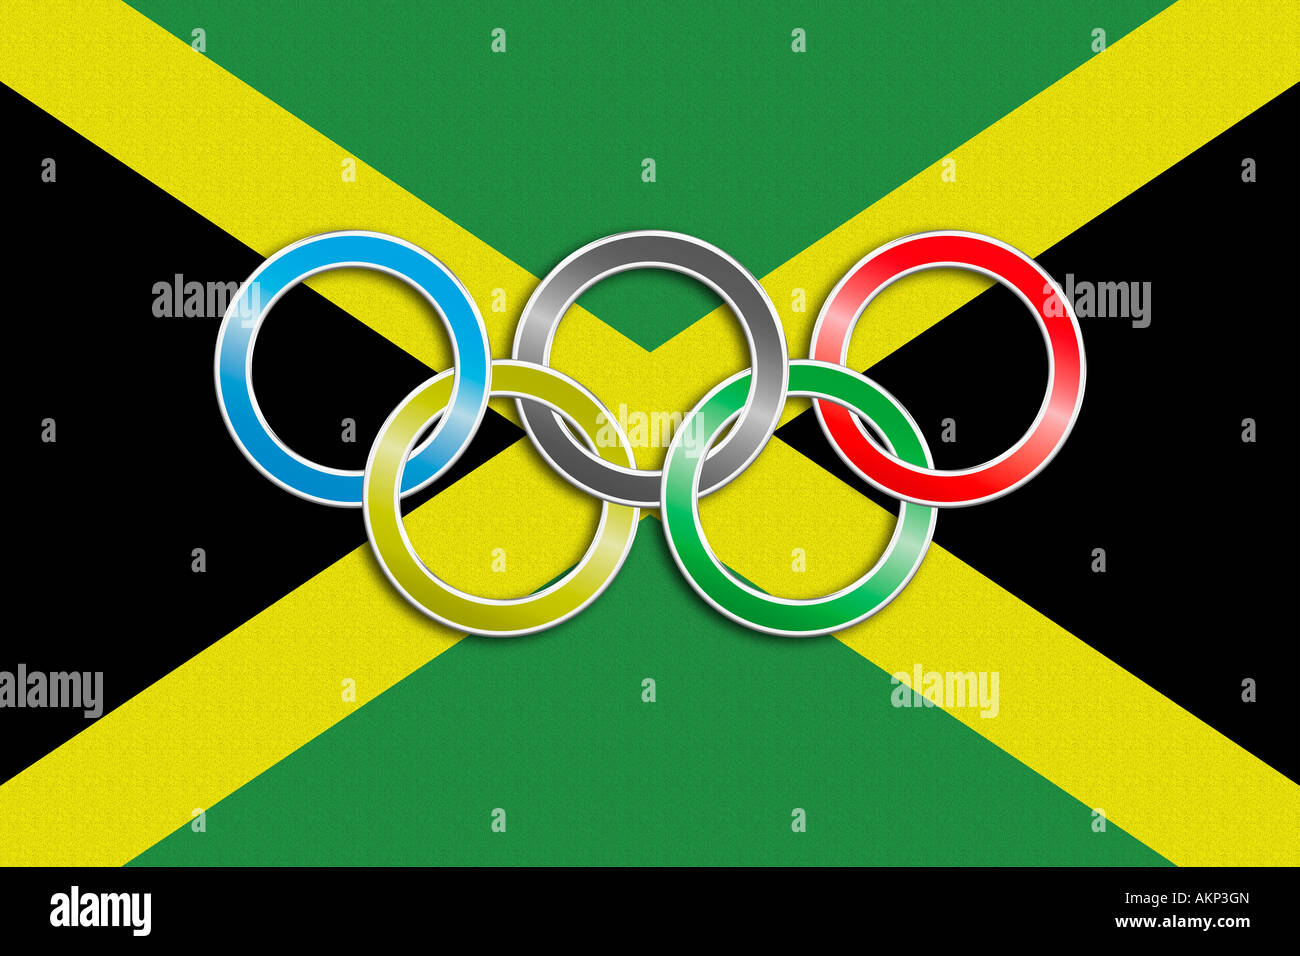 Flag Of Jamaica With Olympic Symbol Stock Photo 15047732 Alamy